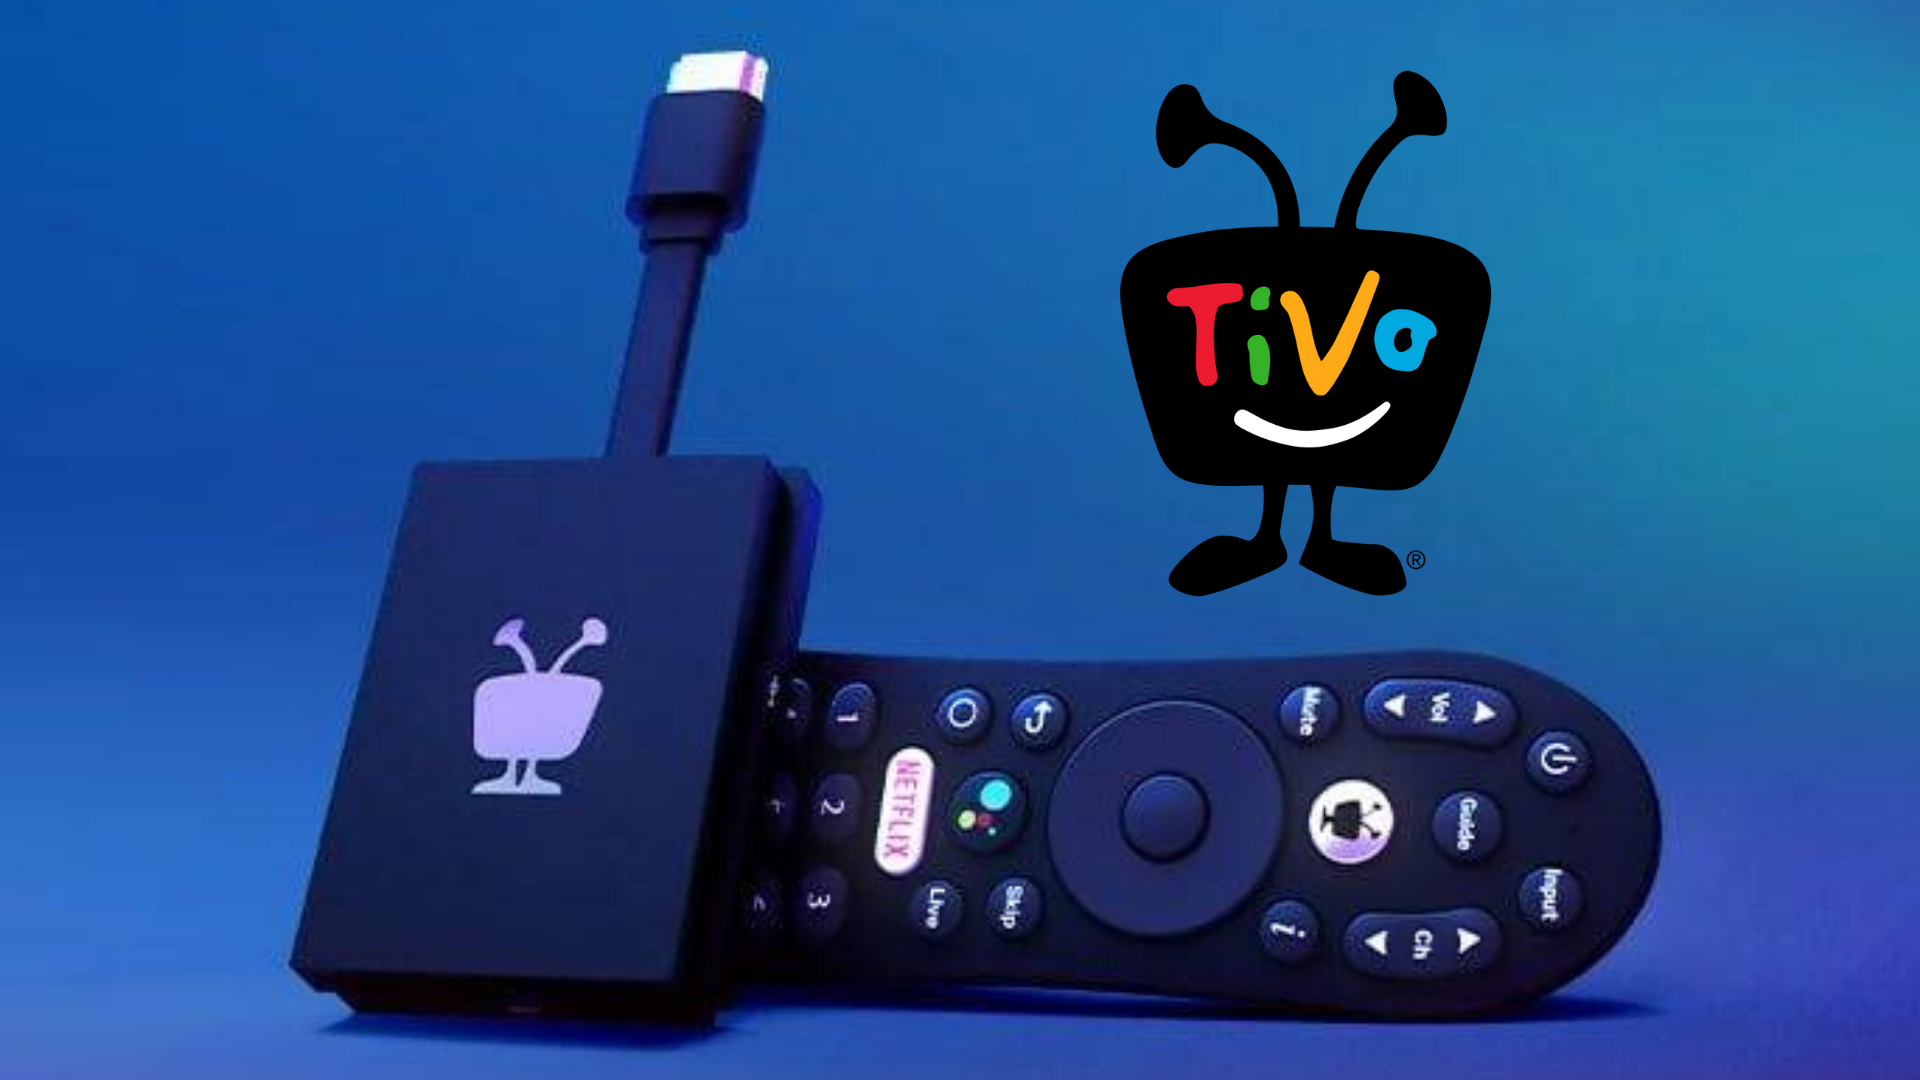 TiVo - Gizmeon Gizmott News